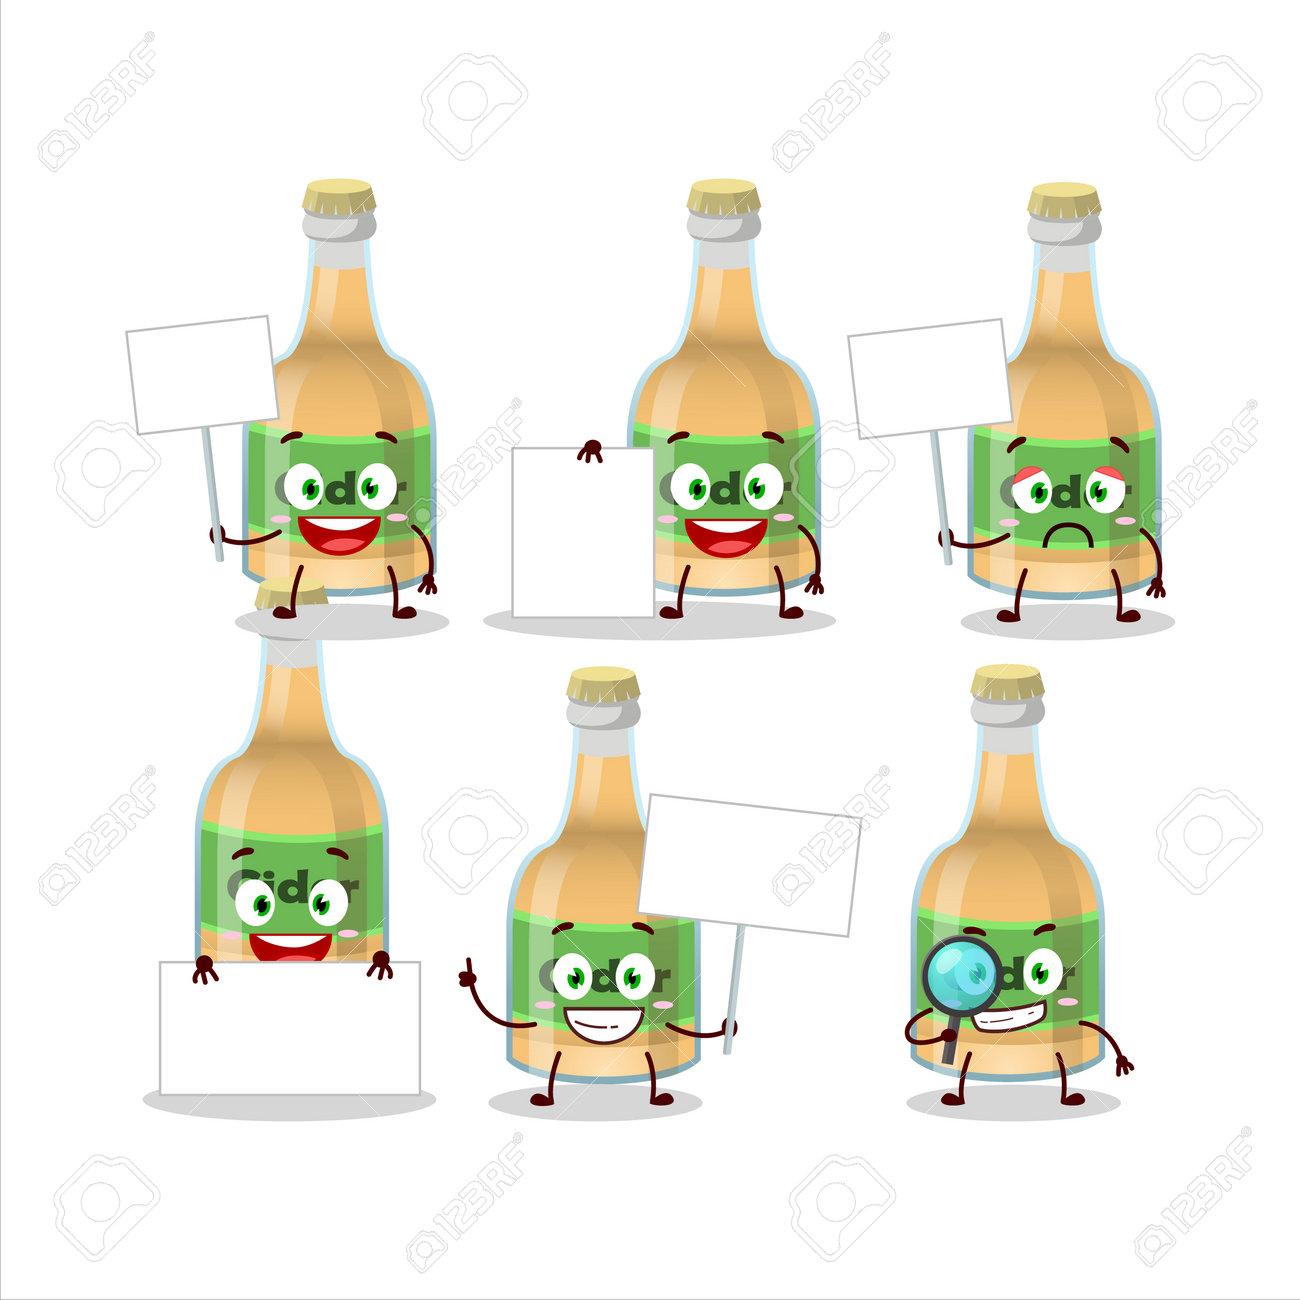 Cider bottle cartoon character bring information board. Vector illustration - 172516088